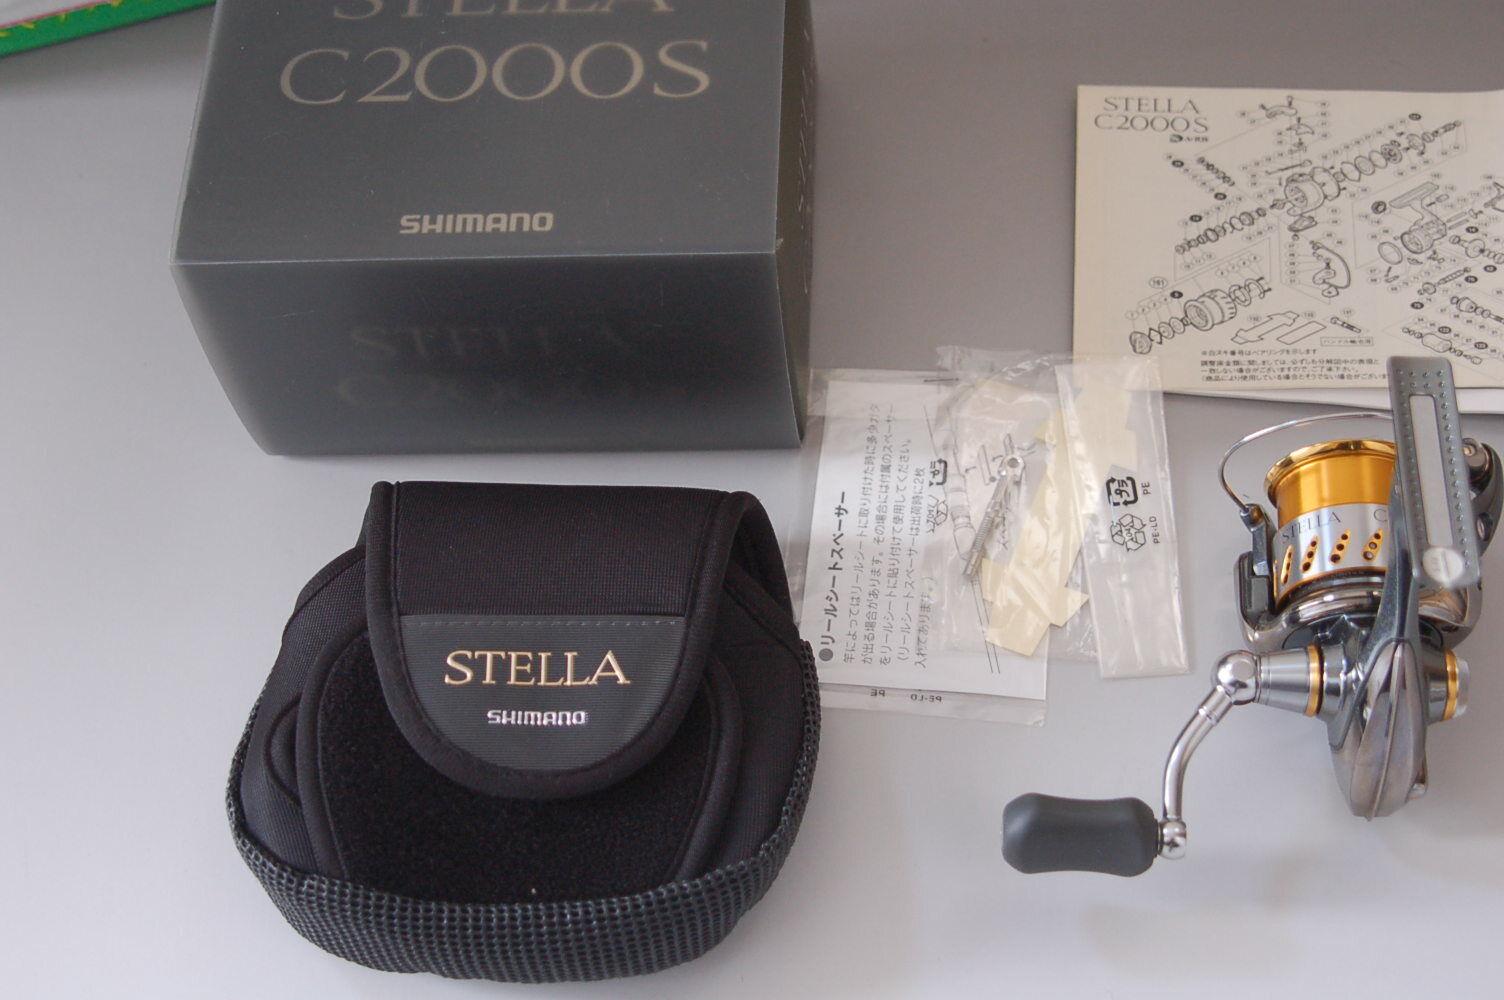 2007 SHIMANO STELLA C2000S In Box Very good